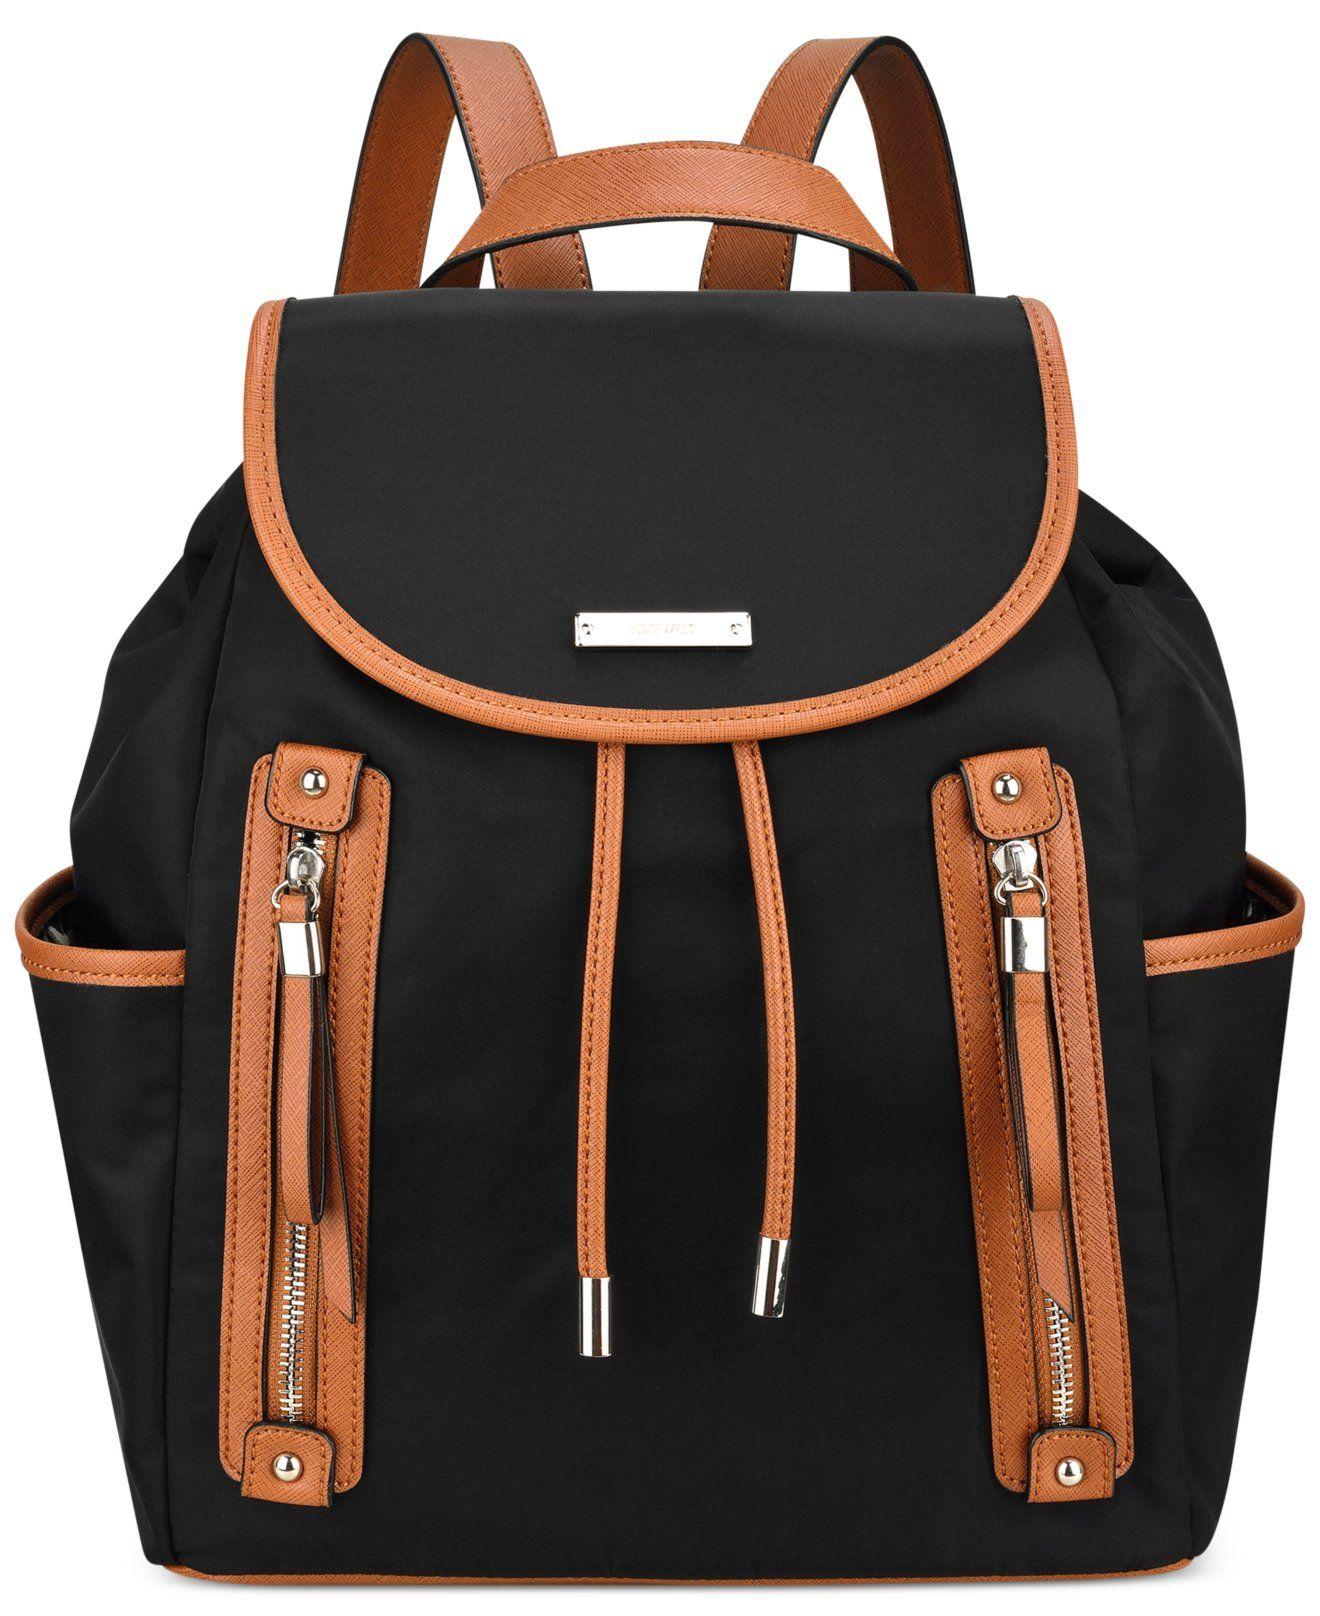 87f03ec0e Nine West 9 On The Go Backpack - Backpacks - Handbags & Accessories - Macy's